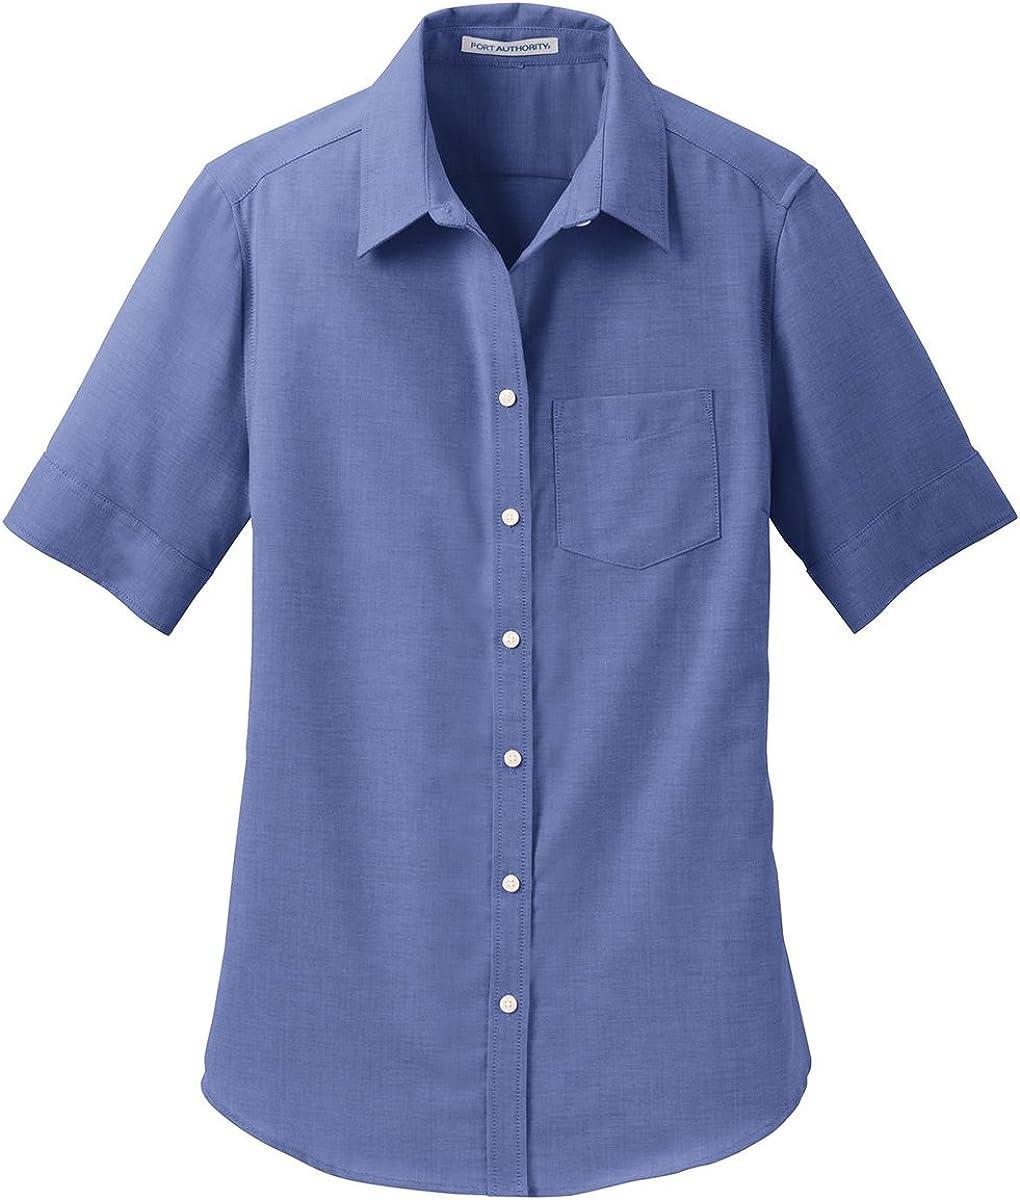 Port Authority Ladies Short Sleeve SuperPro Oxford Shirt